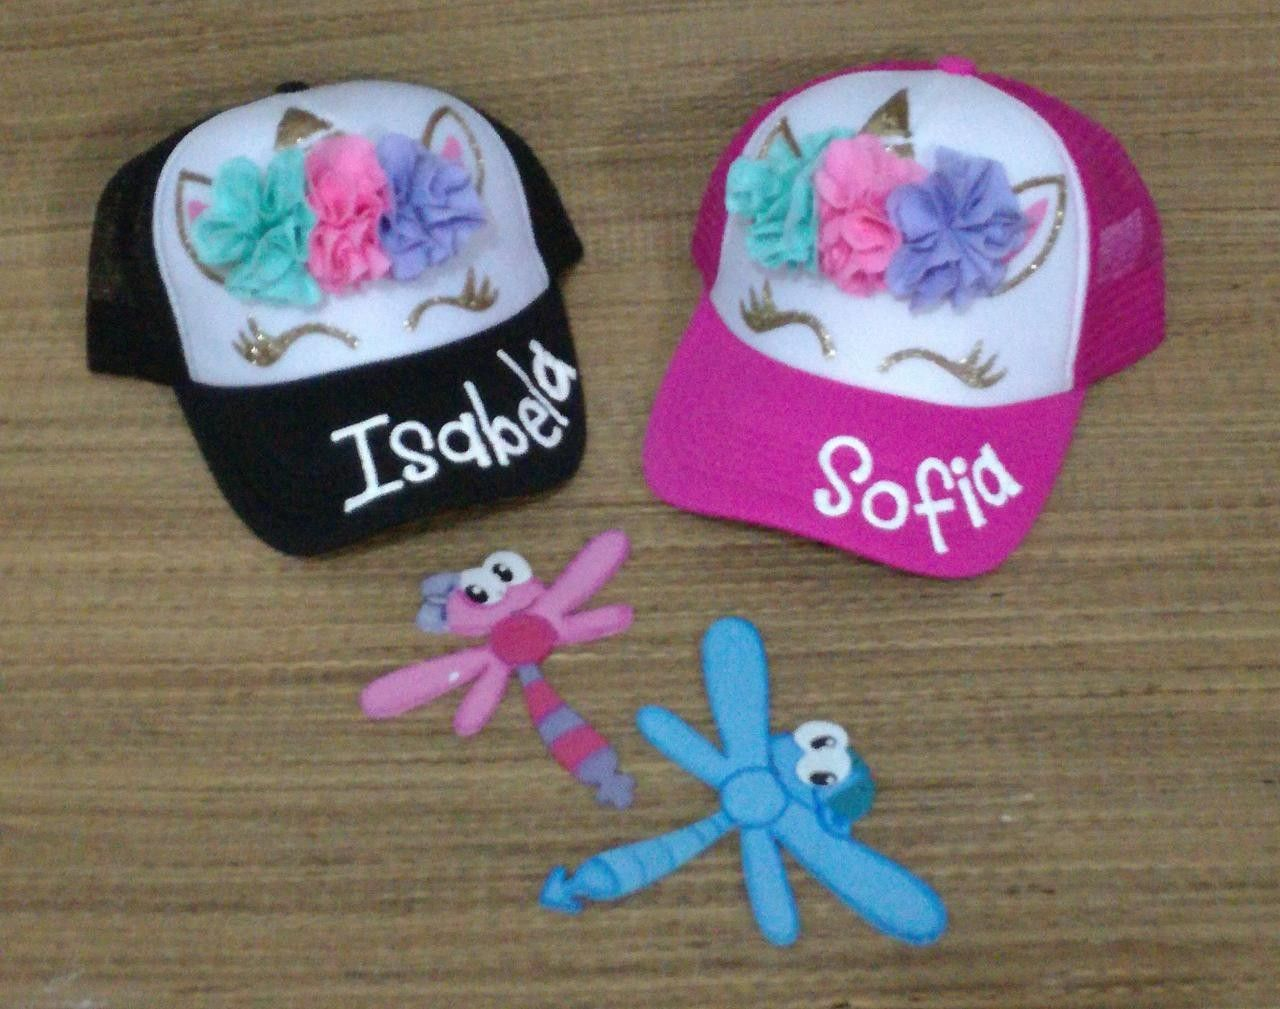 Gorras personalizadas Unicornio Abilia Shopping Whatsapp 3132196957 ... 986f56461b9